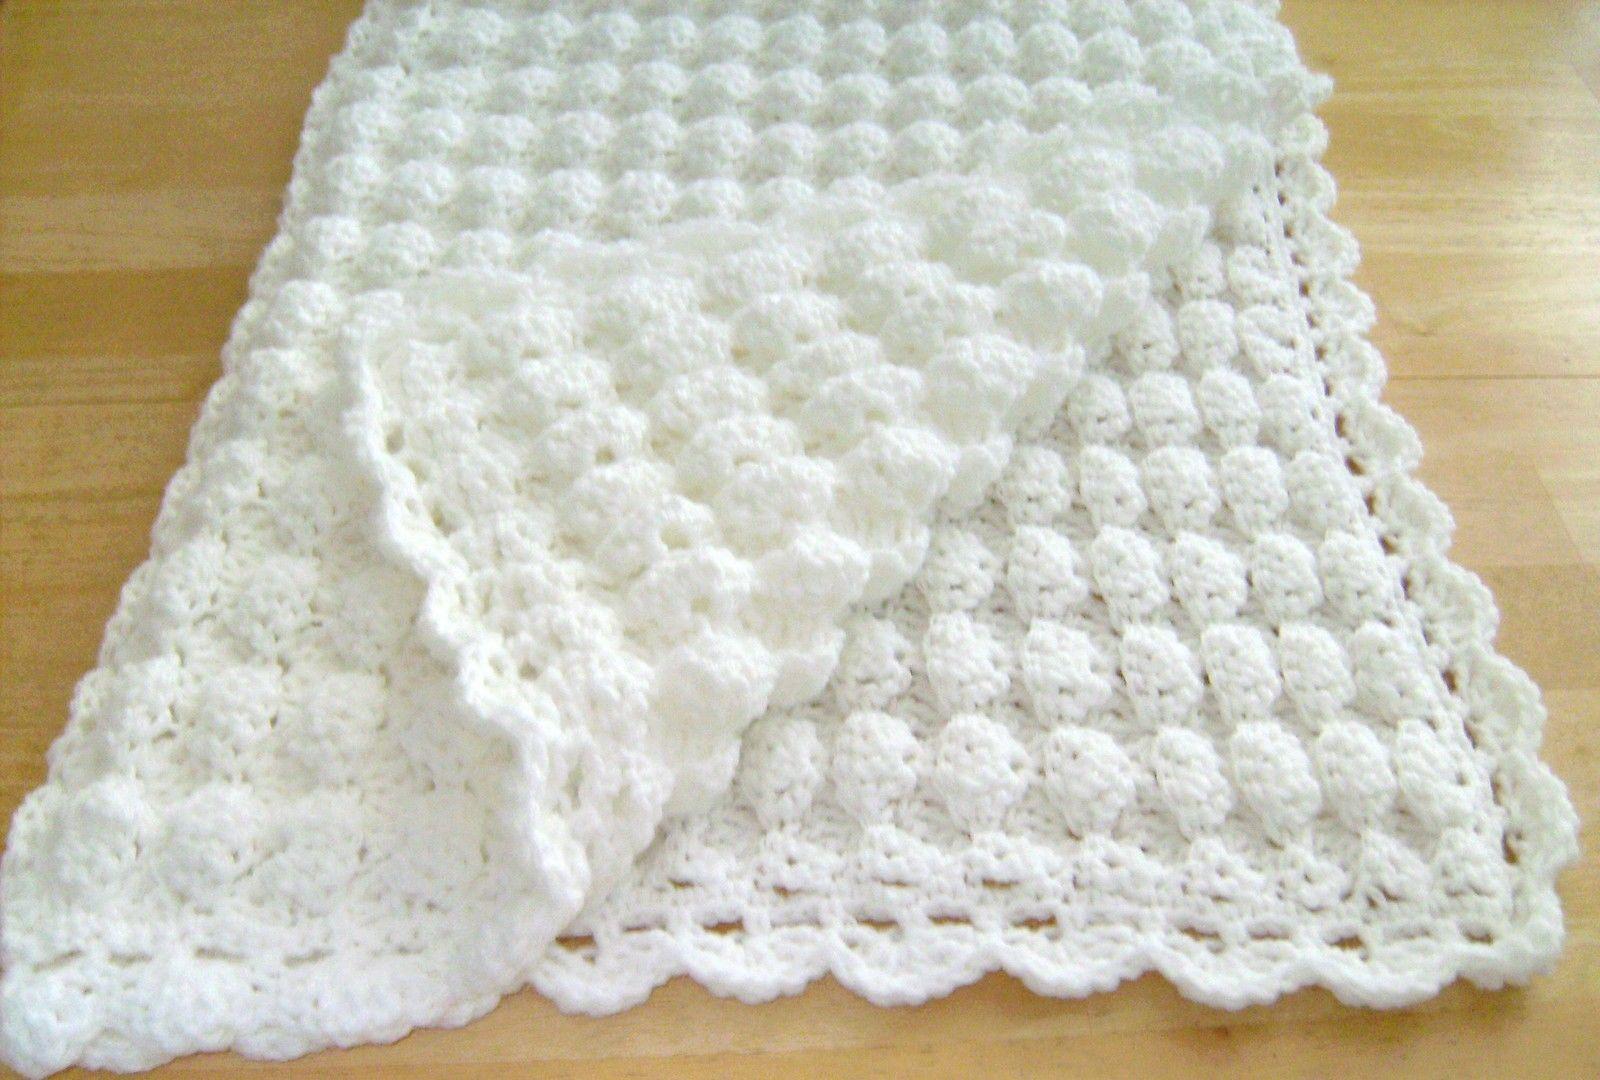 image-crochet-shell-baby-blanket-pattern-download | Crocheting ...